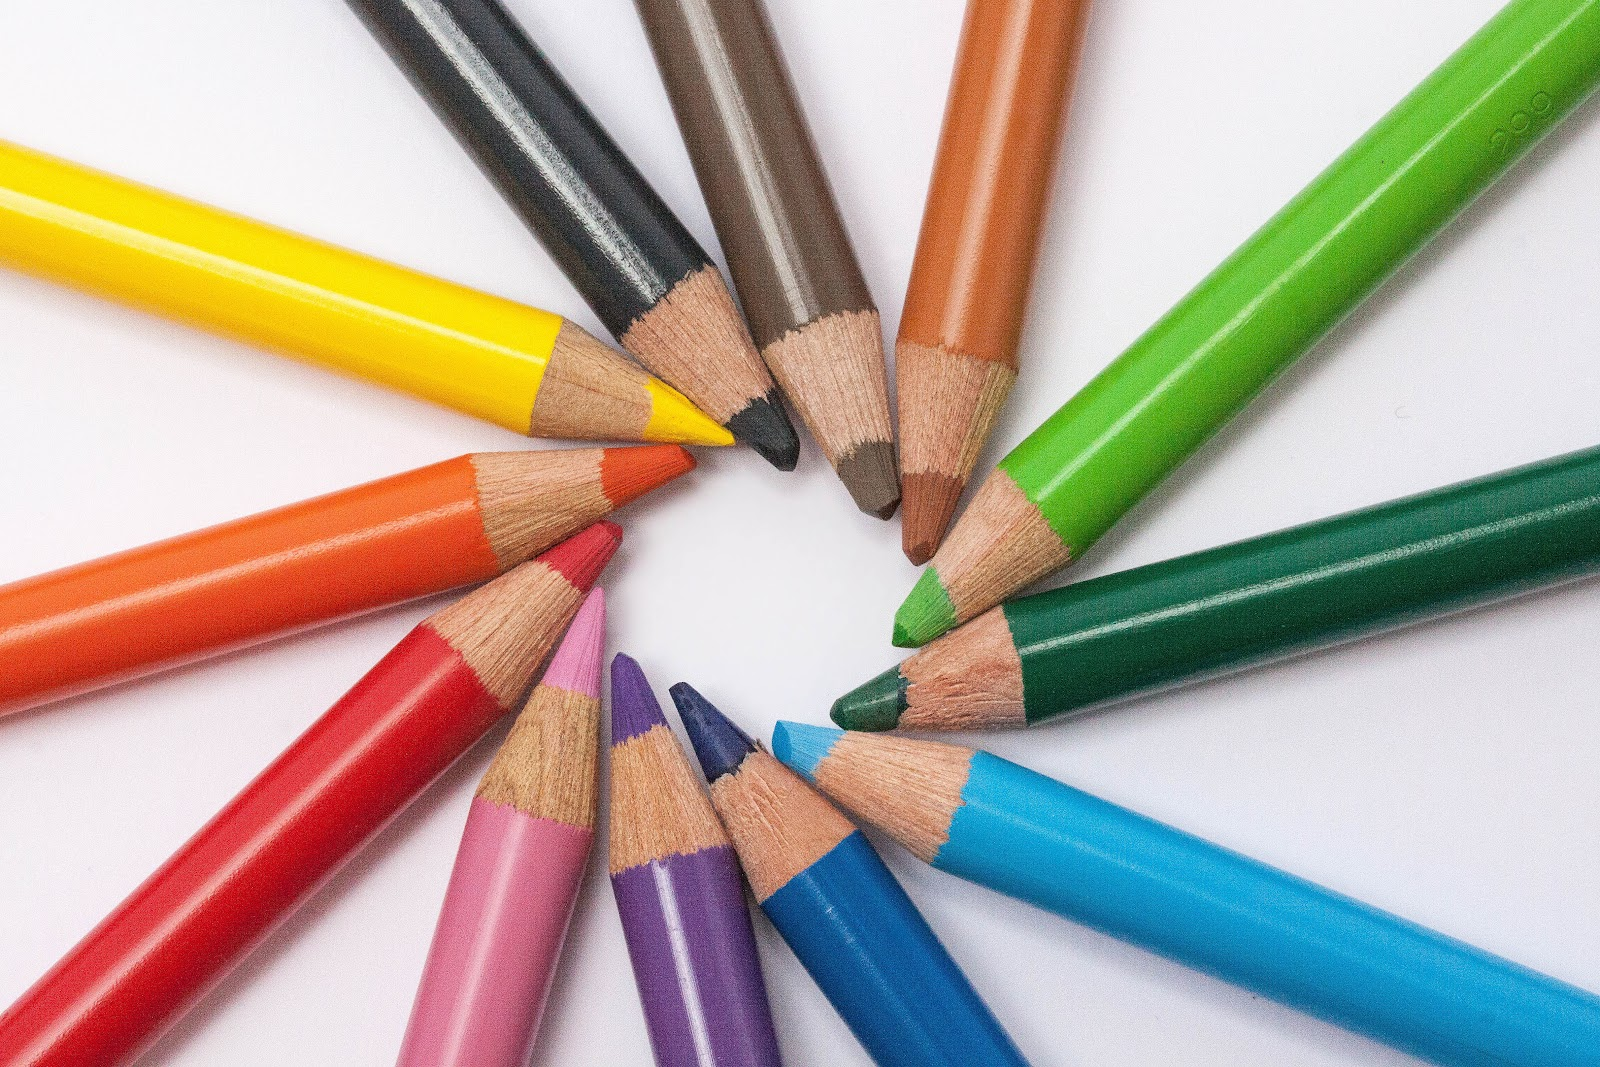 Free stock photos of school supplies · Pexels